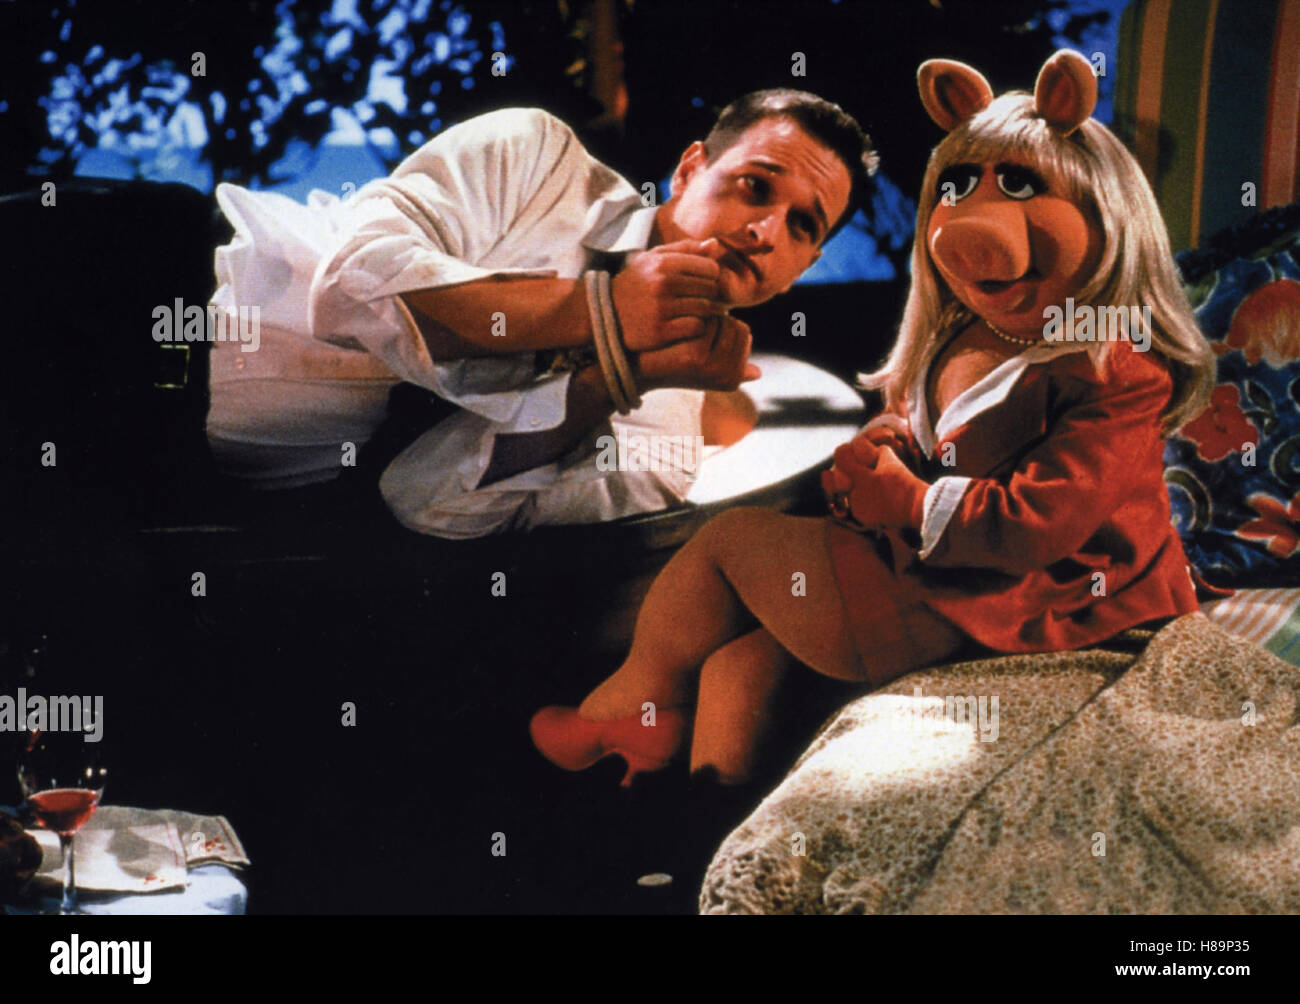 Muppets aus dem All, (MUPPETS FROM SPACE) USA 1999, Regie: Tim Hill, JOSH CHARLES, Stichwort: Fesseln, Miss Piggy - Stock Image